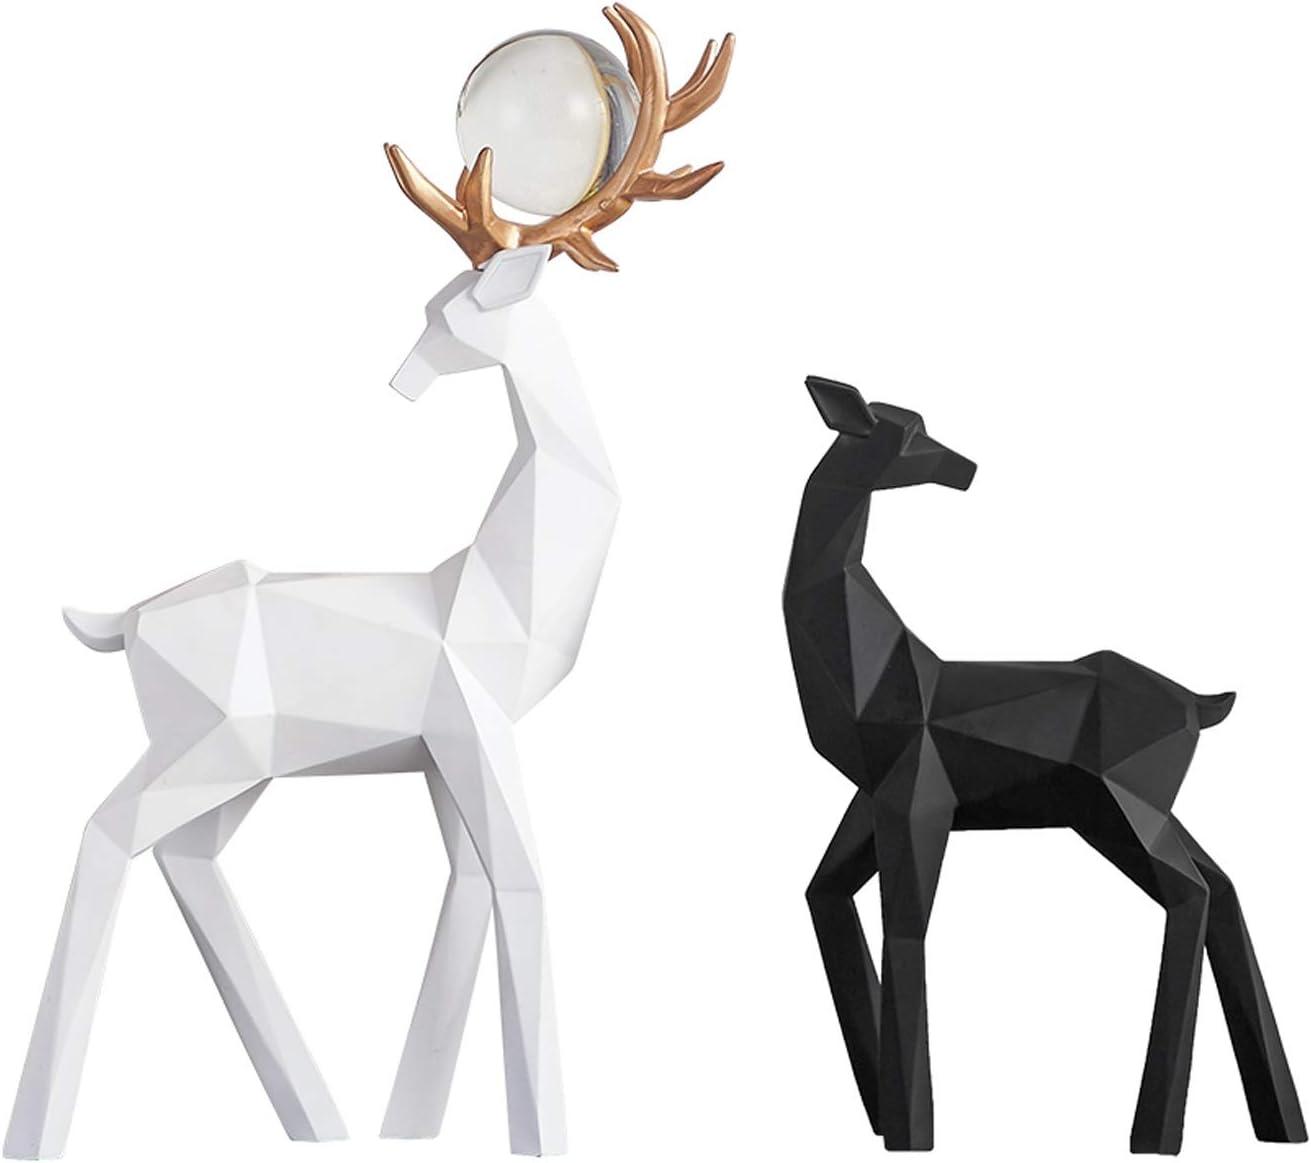 wanhaishop Under blast 70% OFF Outlet sales Desktop Decoration Feng Shui Statue Decora Lucky Deer